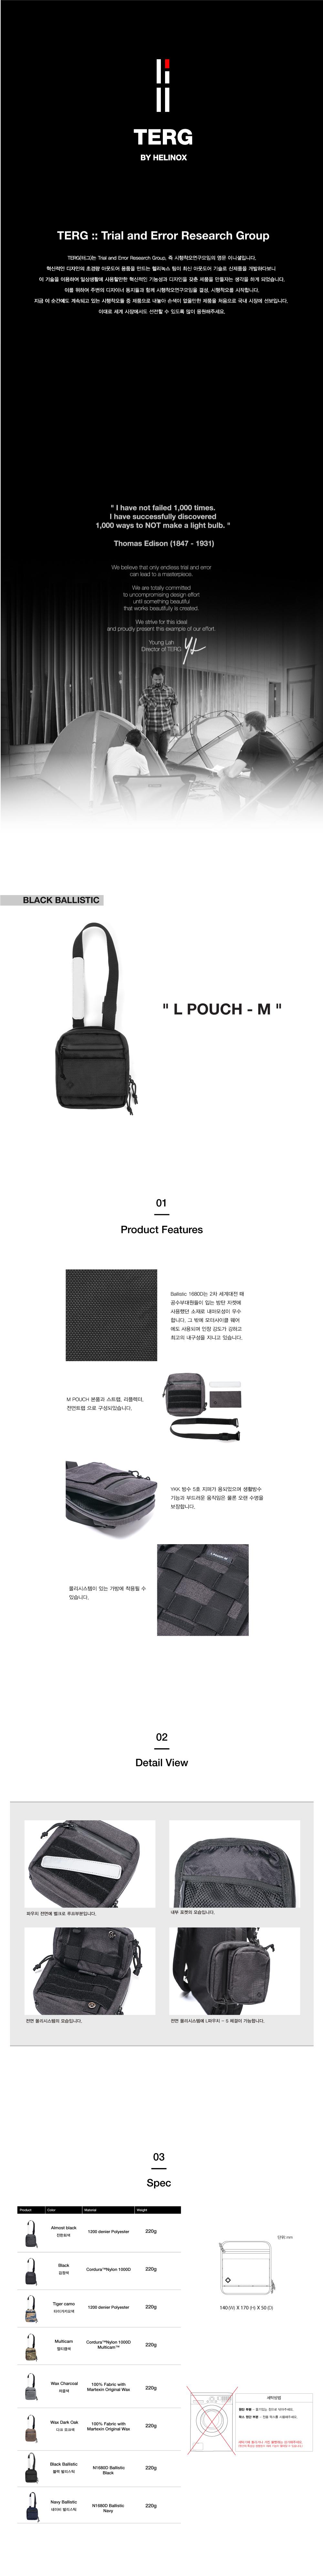 20180406-L-Pouch-M-Black-Ballistic.jpg